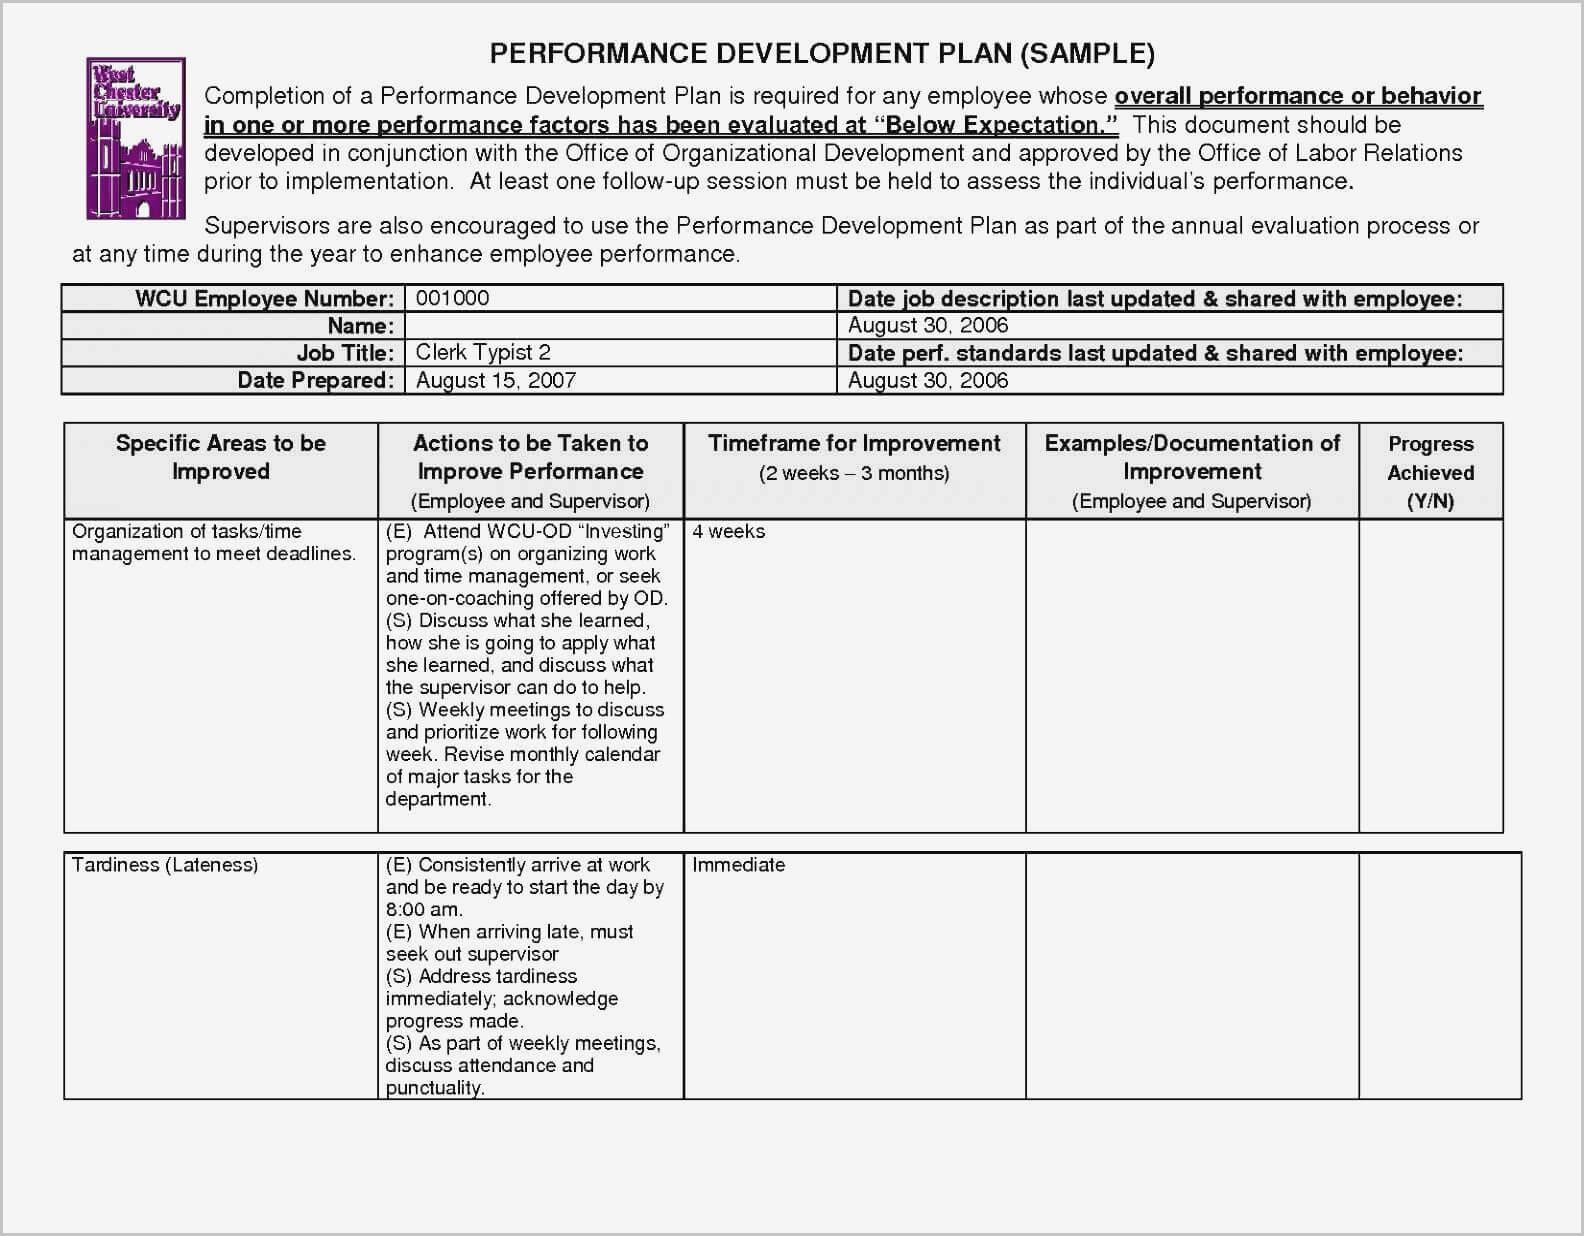 Resume Templates Microsoft Word 2007 Free Download - Resume regarding Resume Templates Word 2007